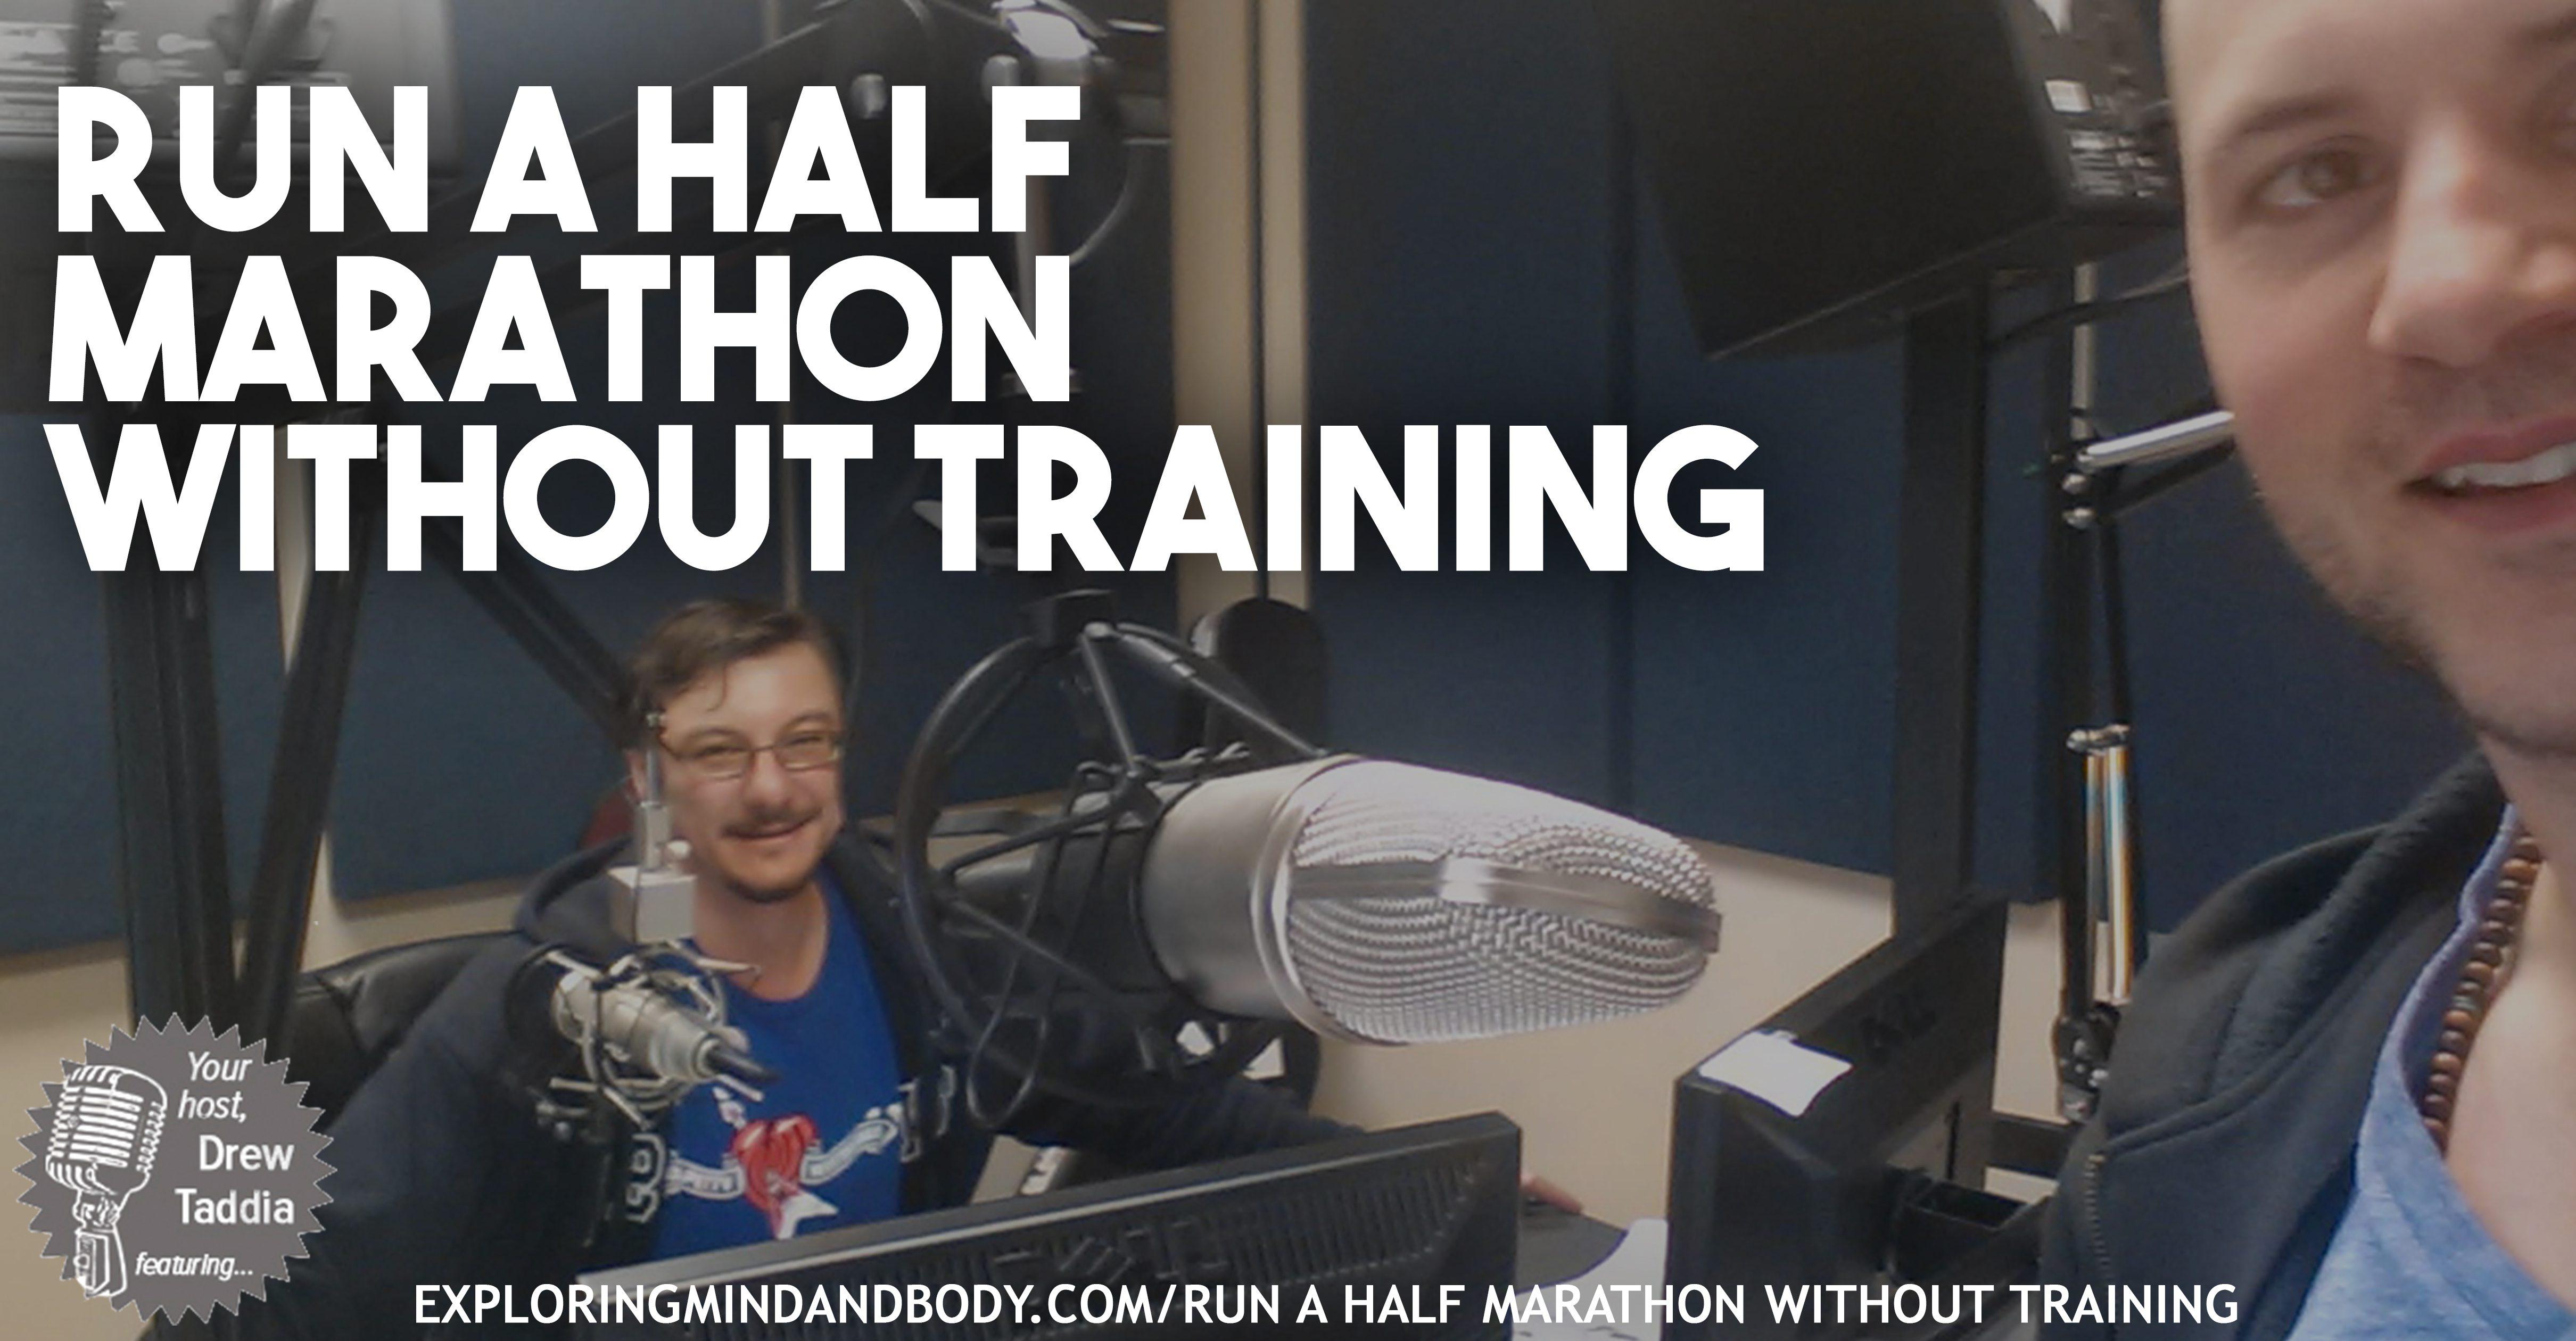 Run a half marathon without training